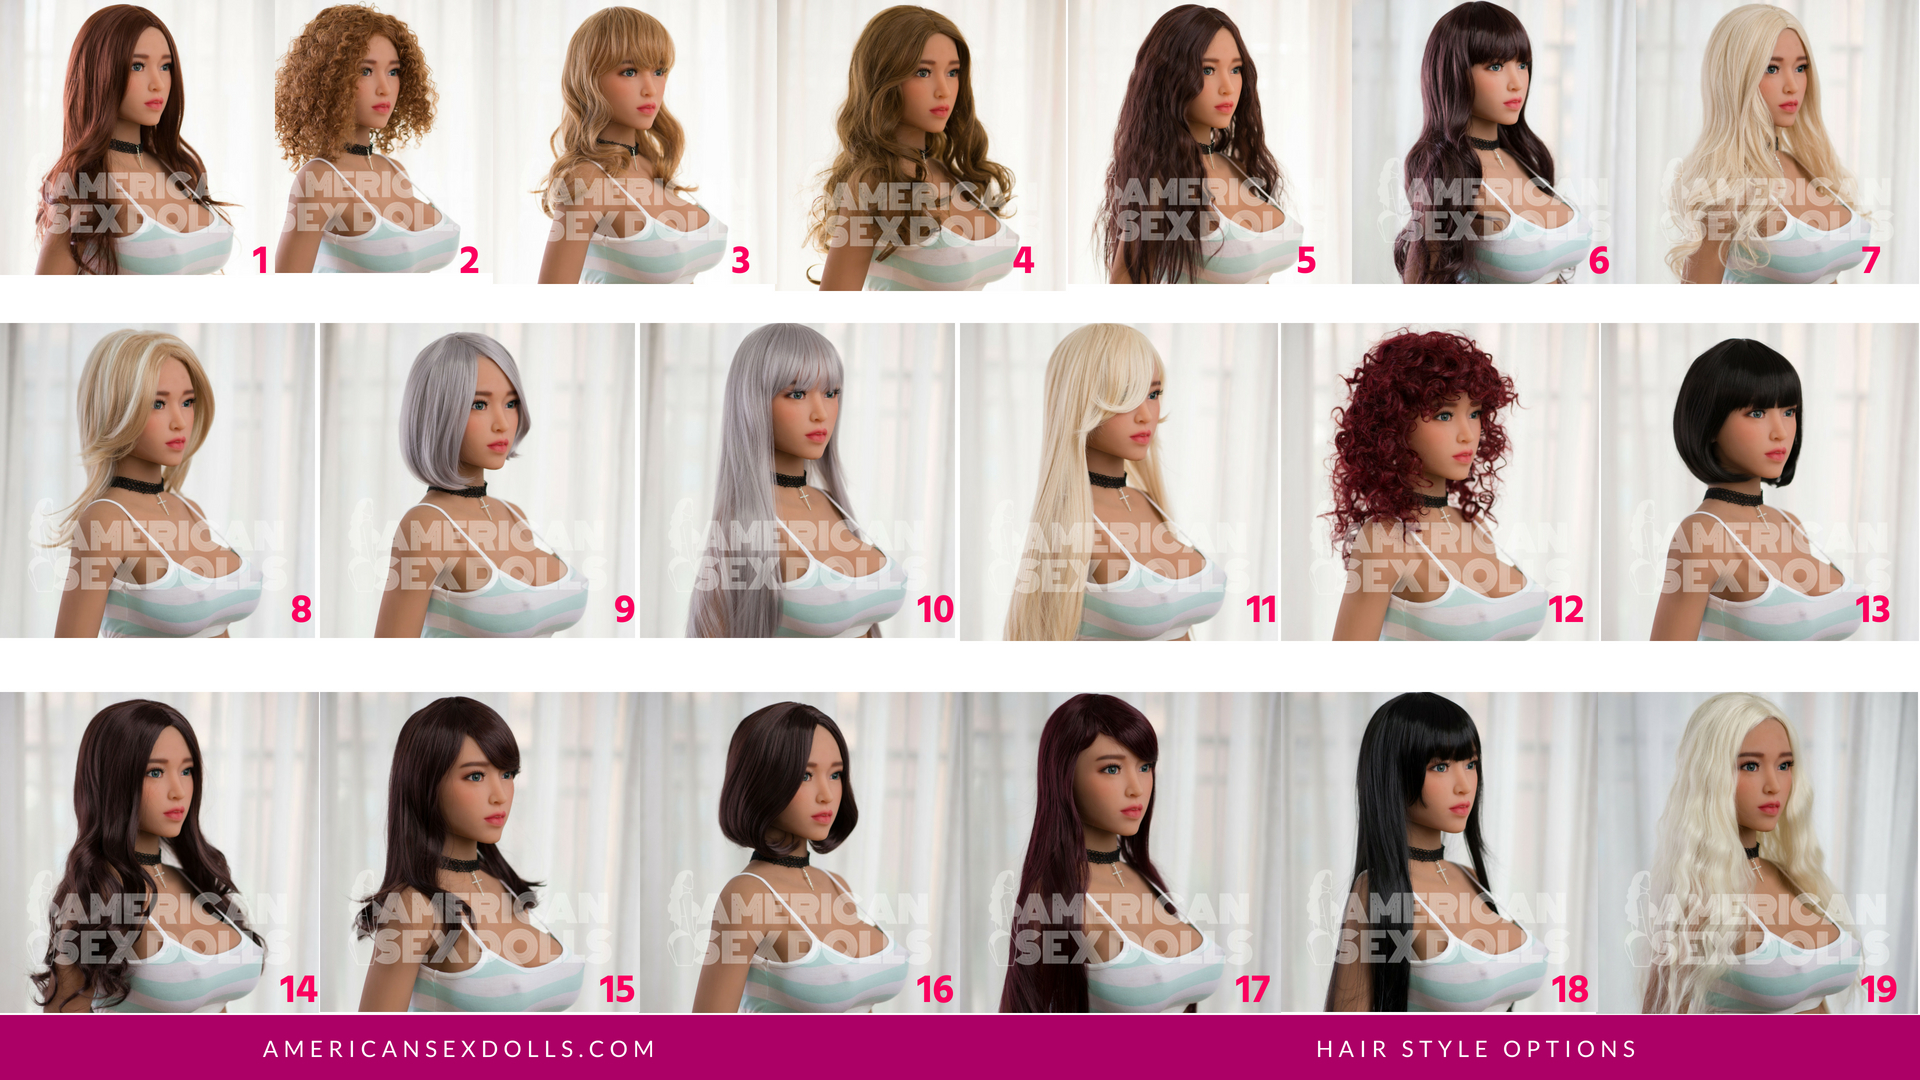 6Ye hair options